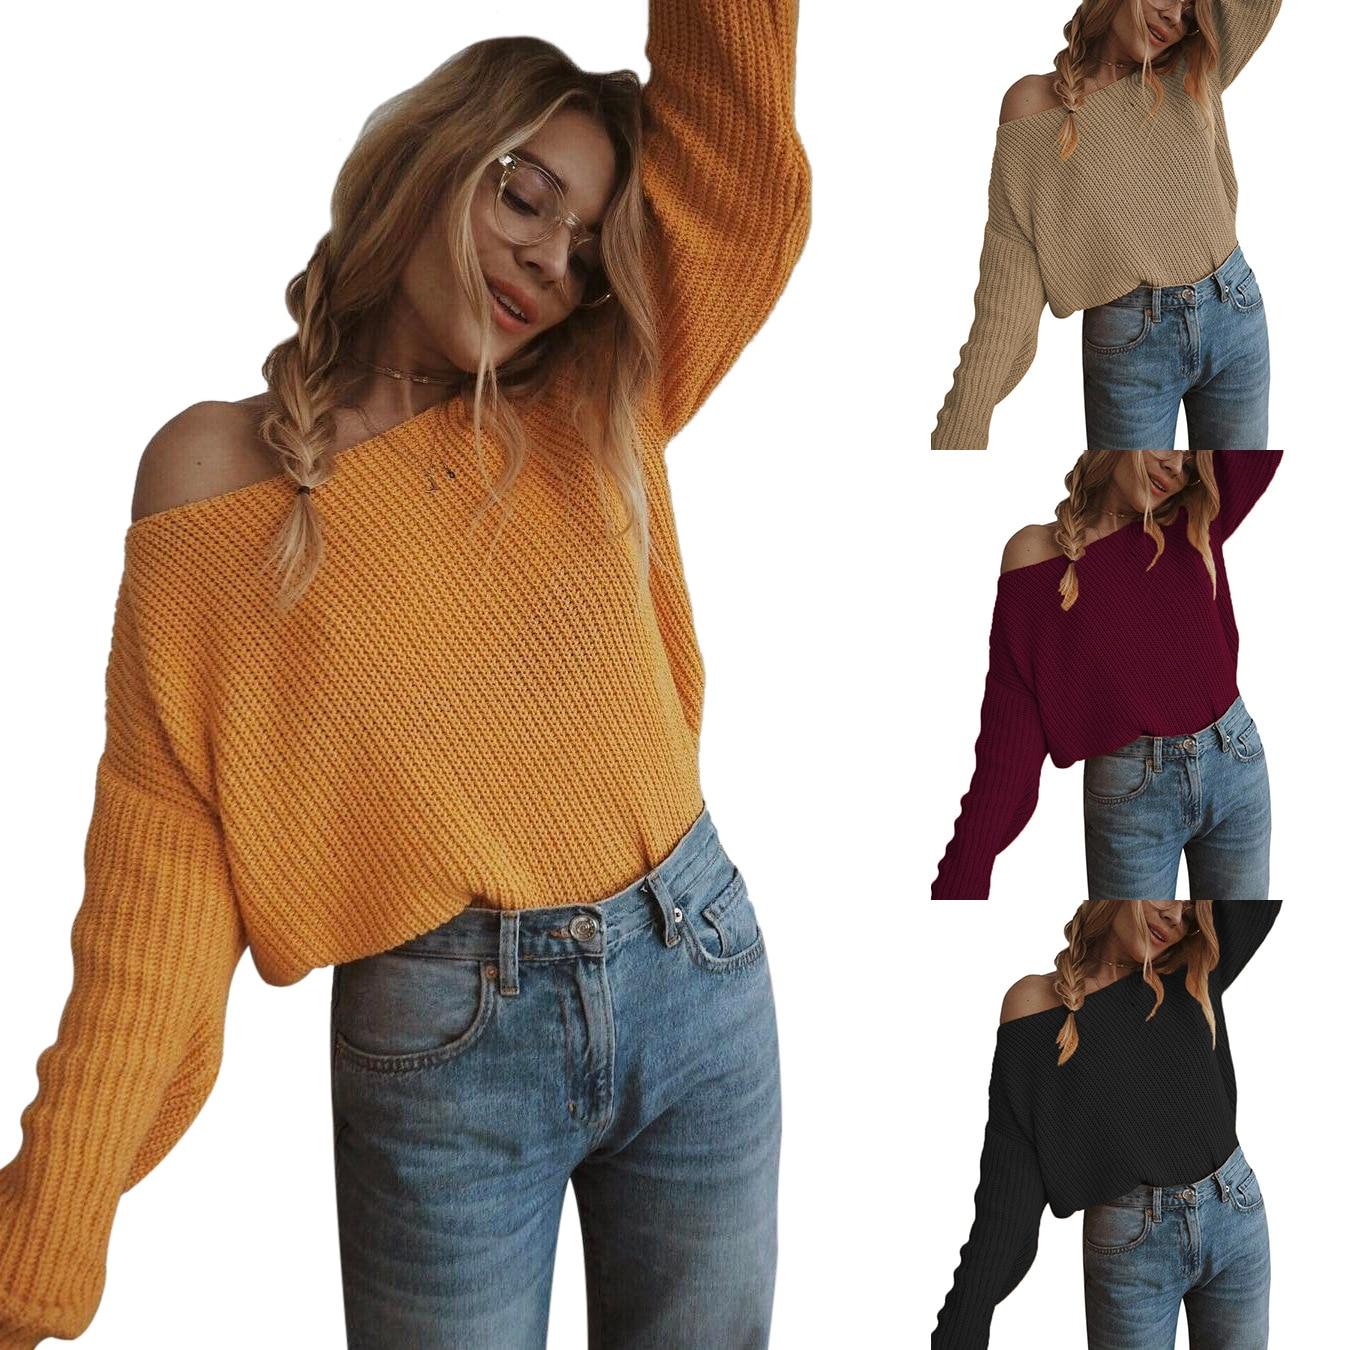 Fora do ombro pullover mulheres camisola de malha camisola das mulheres manga comprida solta jumpers camisola de grandes dimensões puxar femme plus size 5XL